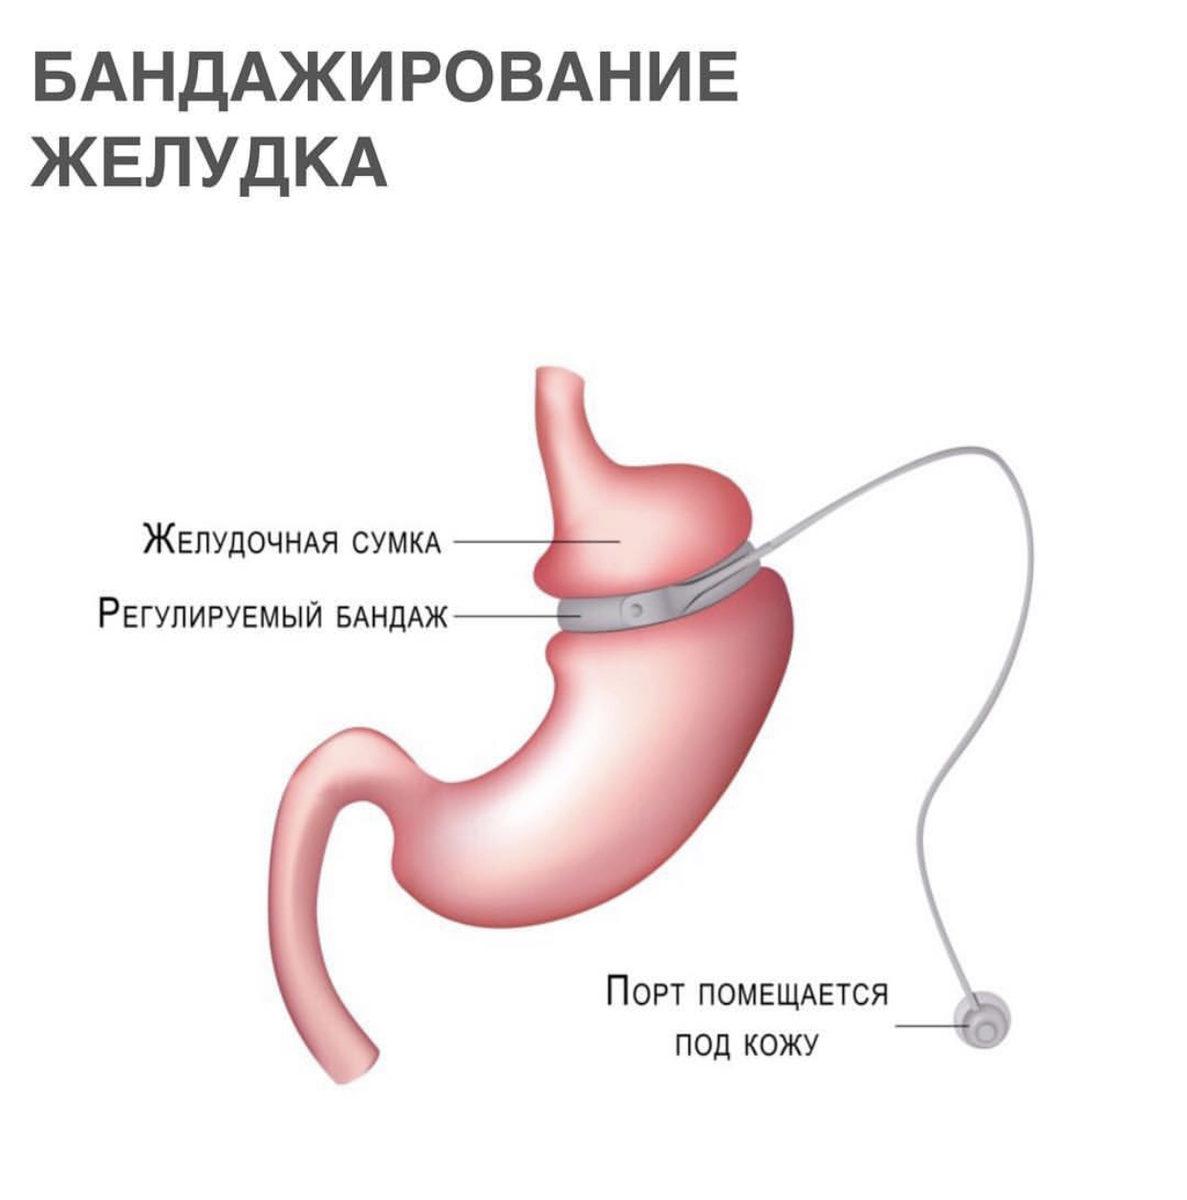 Резекция Желудка Для Похудения Цена Екатеринбург.